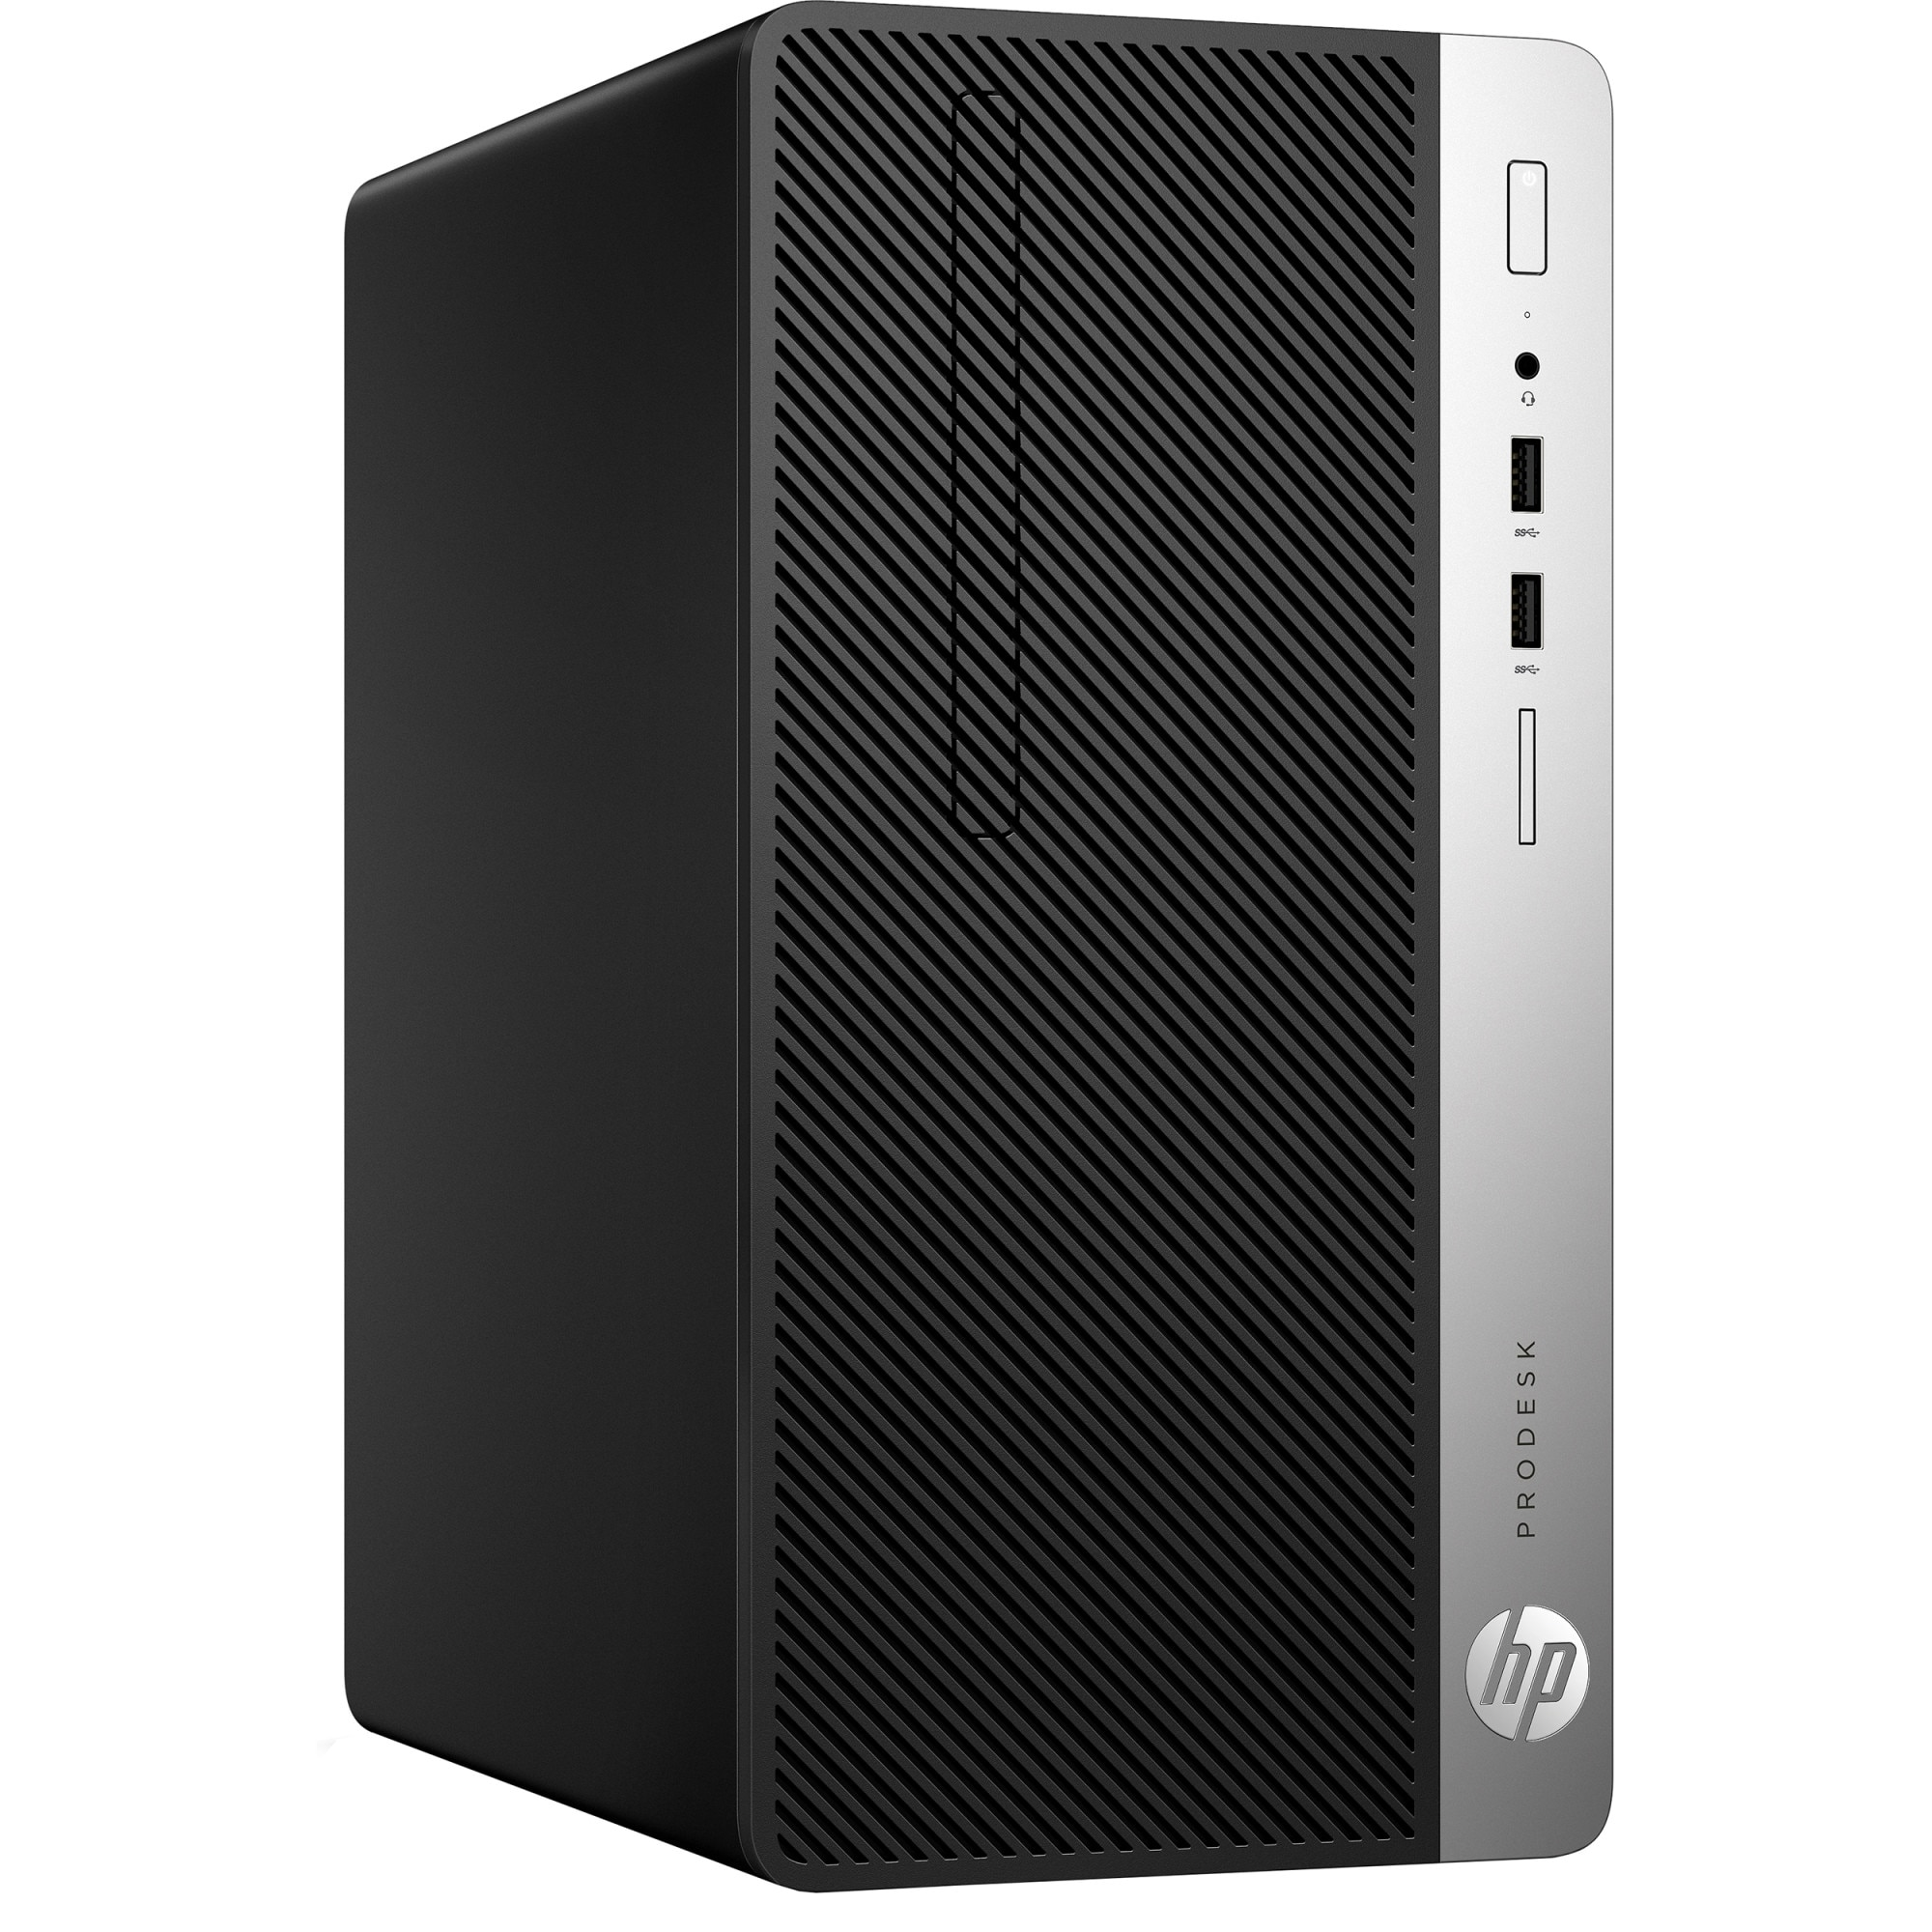 Fotografie Sistem Desktop PC HP ProDesk 400 G6 cu procesor Intel® Core™ i7-8700 pana la 4.60 GHz, Coffee Lake, 16GB, 512GB SSD, Intel® UHD Graphics 630, Microsoft Windows 10 Pro